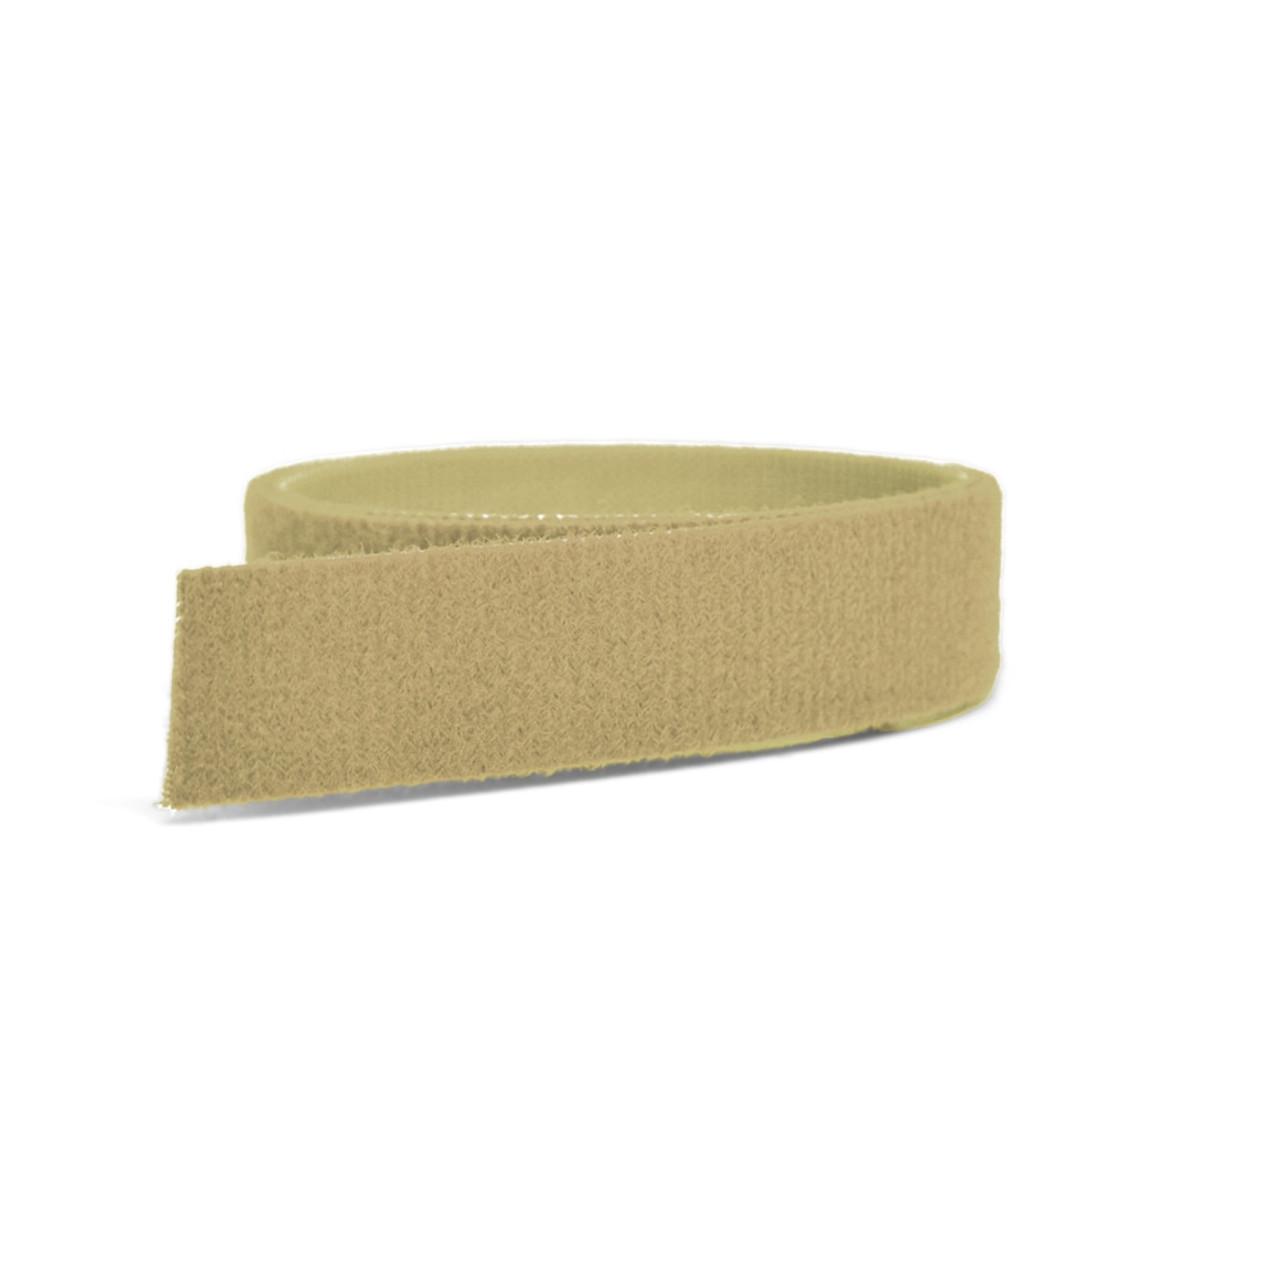 VELCRO® ONE-WRAP® Tape - Beige / Velcro Straps - Bundling Straps - Velcro Tie - Velcro Strap